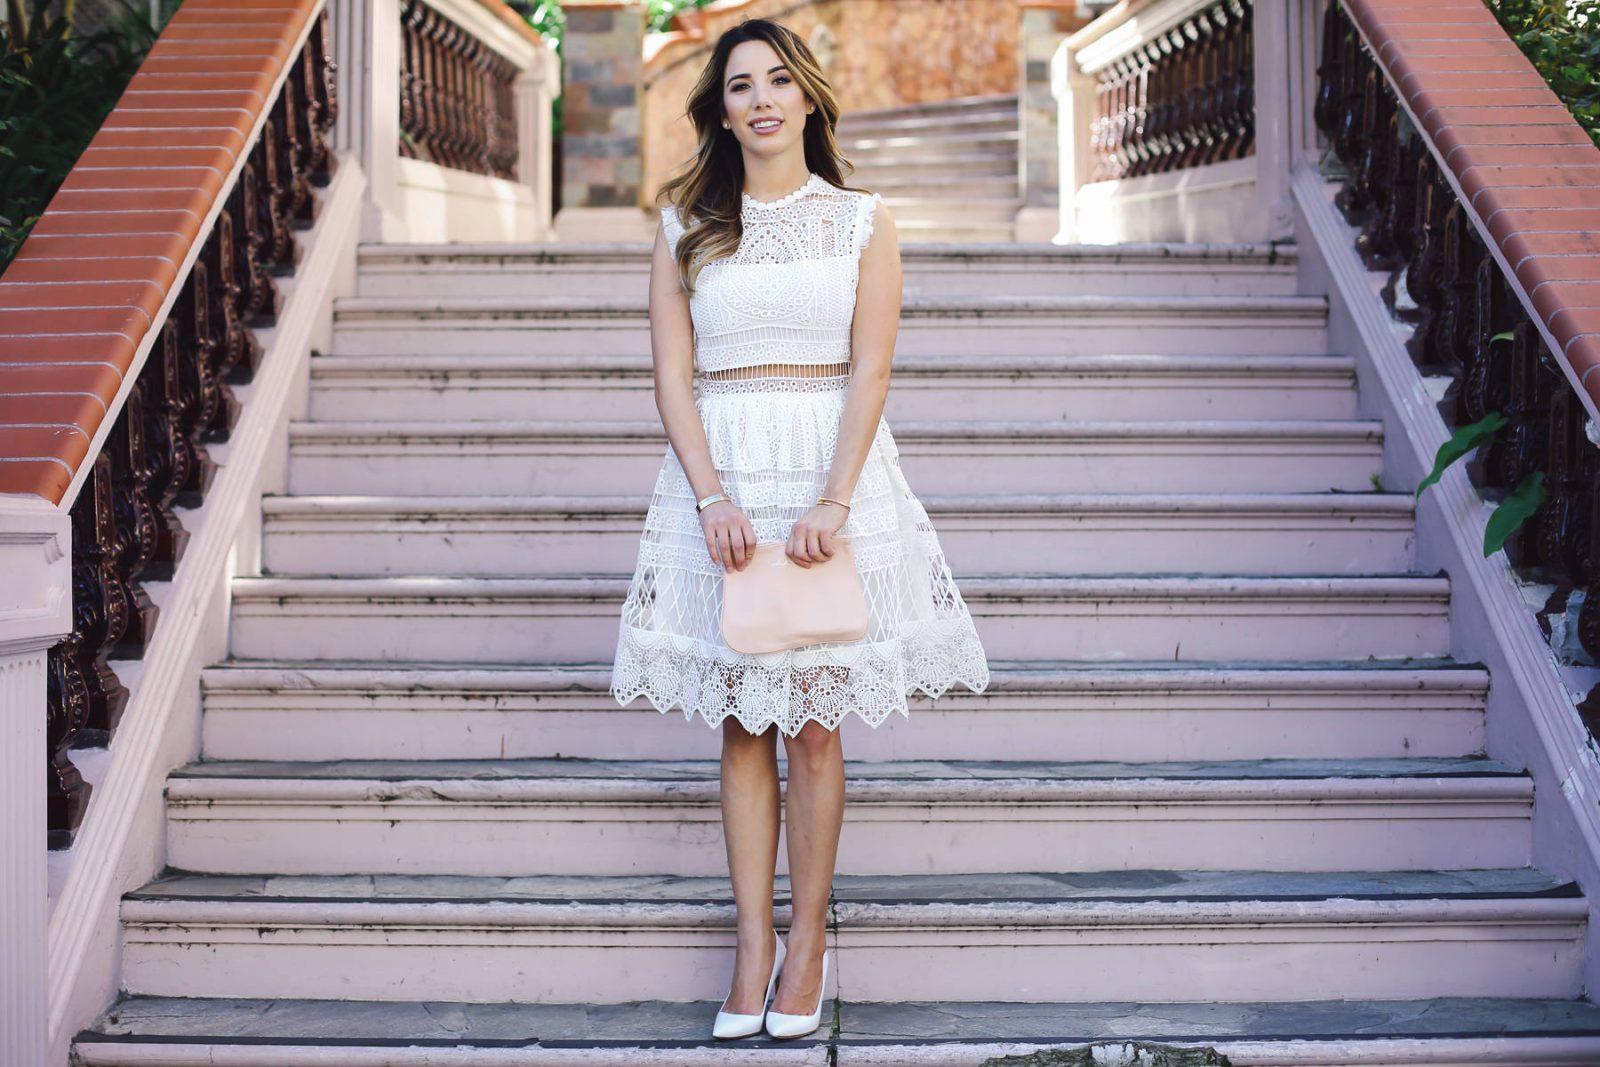 Ariana-Lauren-Fashionborn-White-Laced-Skater-Dress-Fashion-Blogger-Photography-by-Ryan-Chua-8695